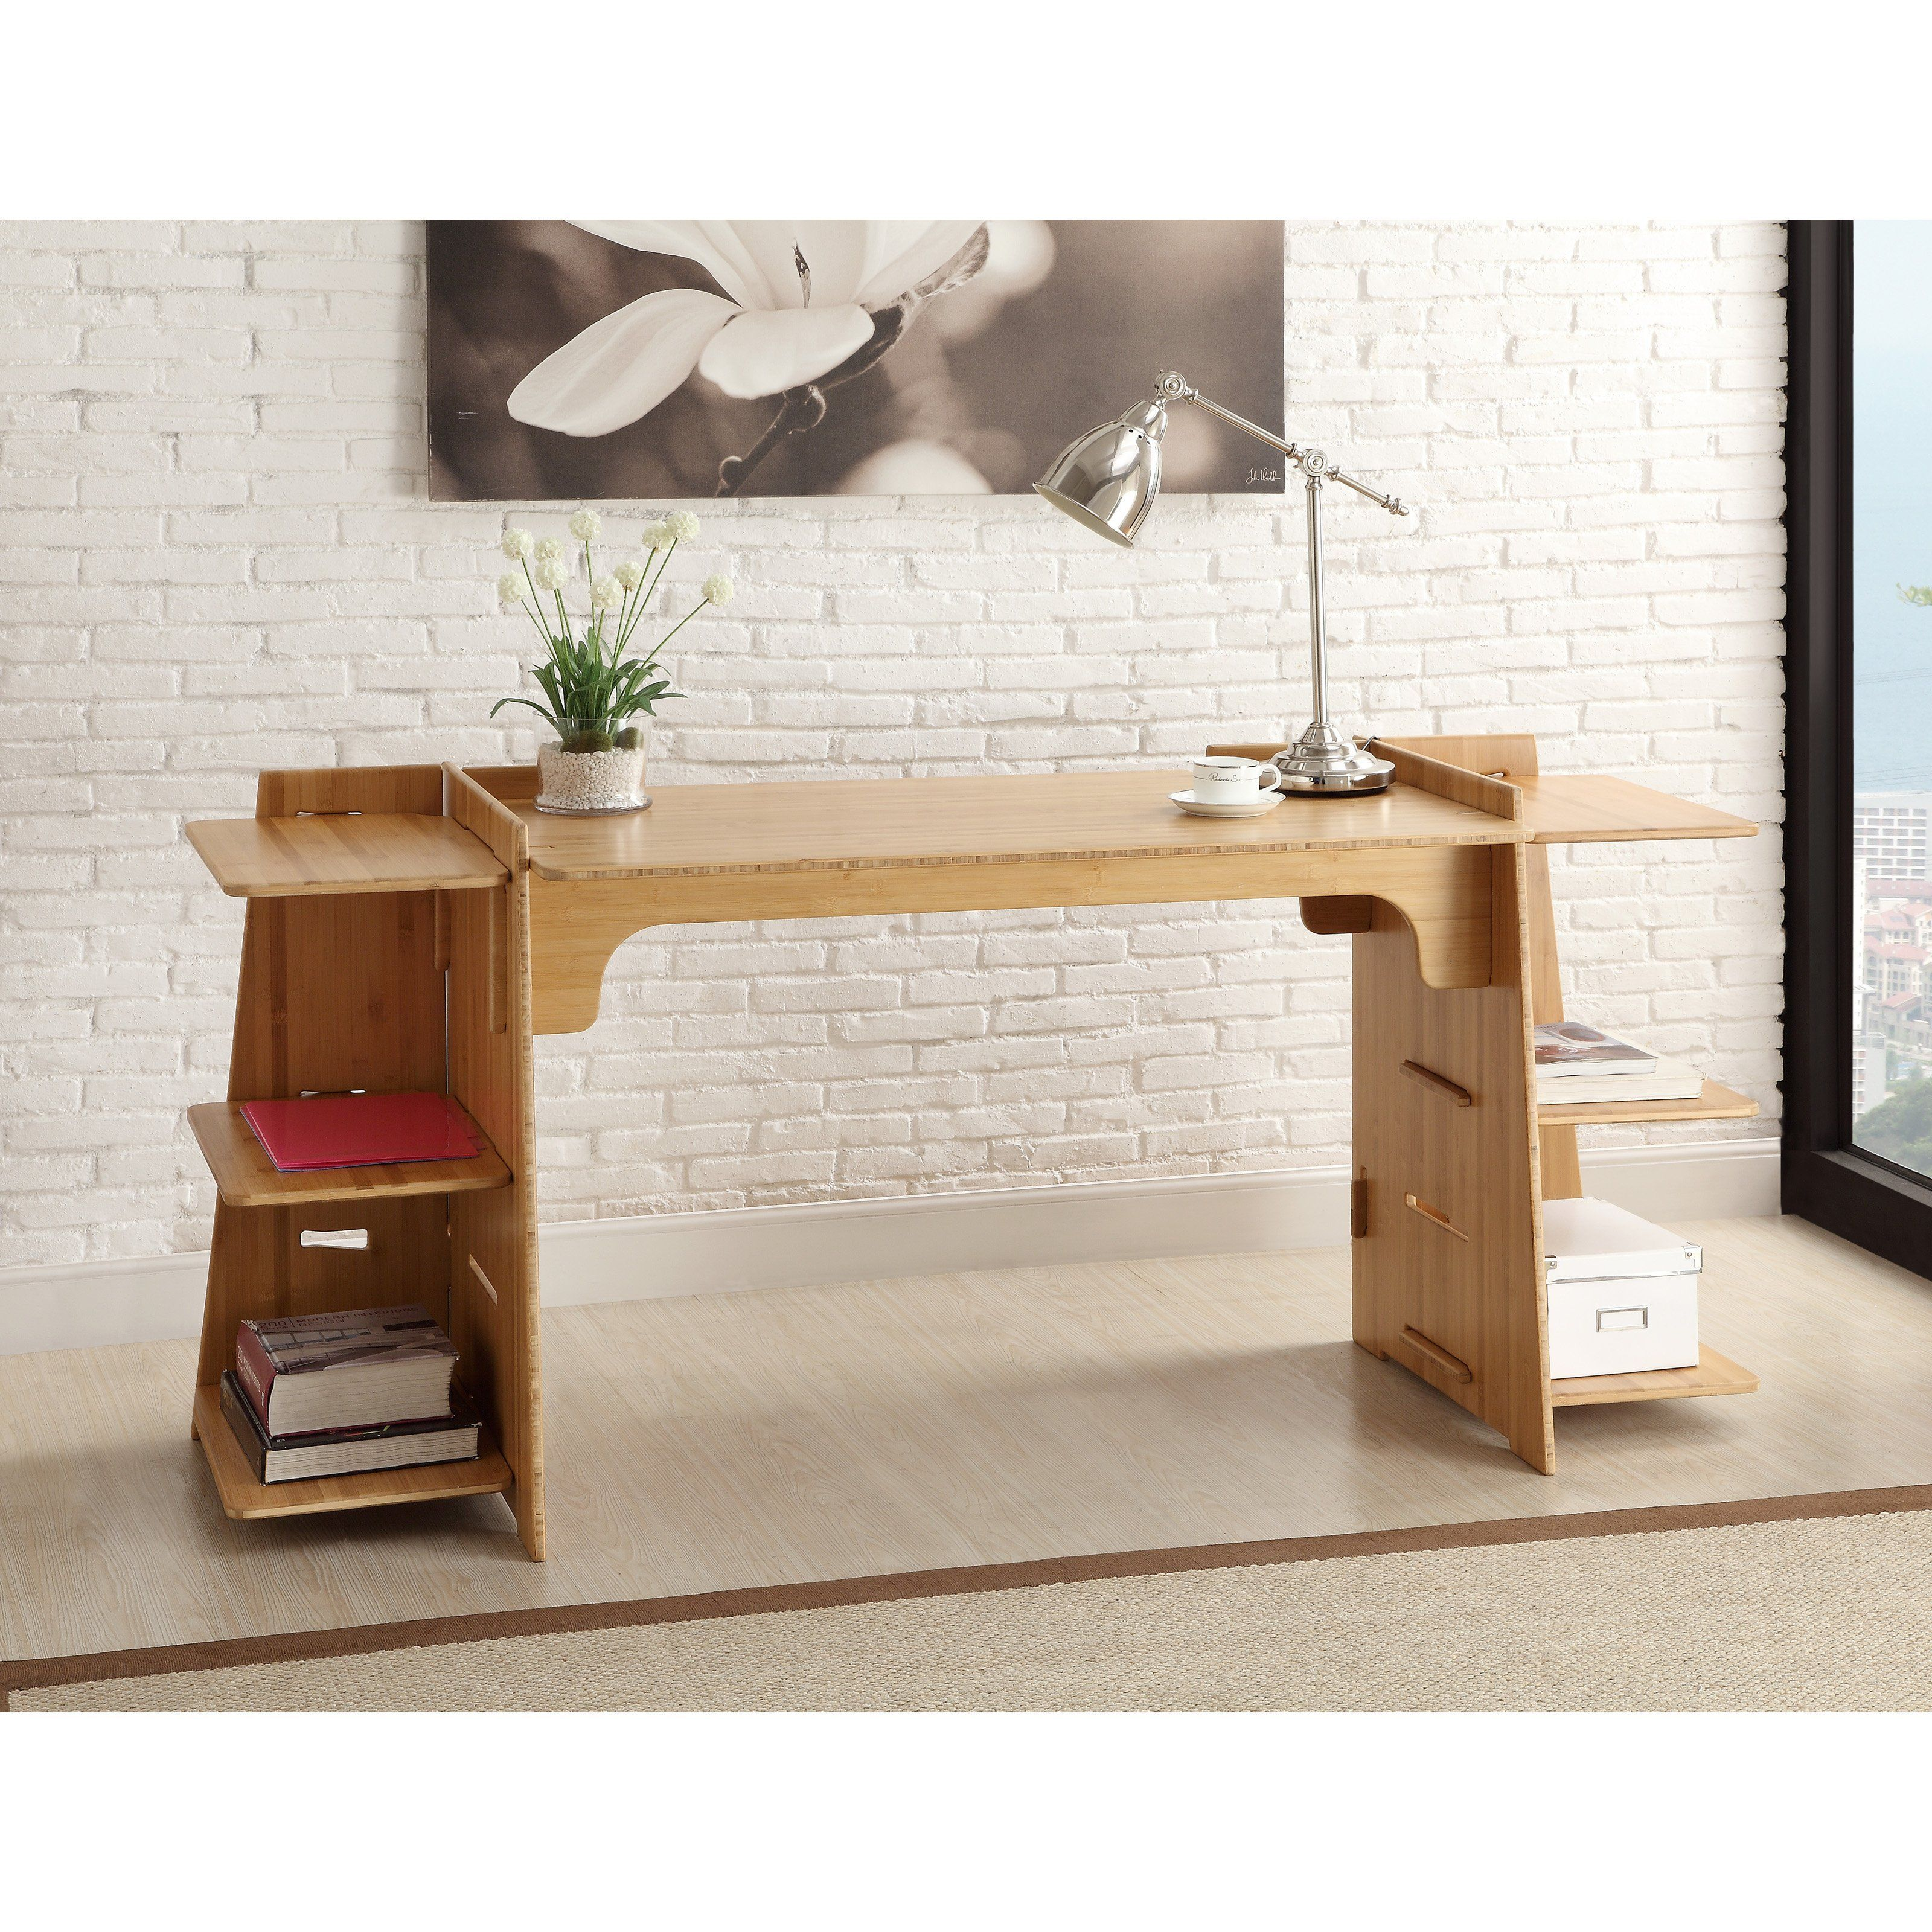 office desk designer. Furniture-graphic-designer-desk-interior-office -furniture-lshaped-glass-amuzing-desk -wooden-laptop-with-marvellous-chic-metal-reading-images-designs-office- Office Desk Designer